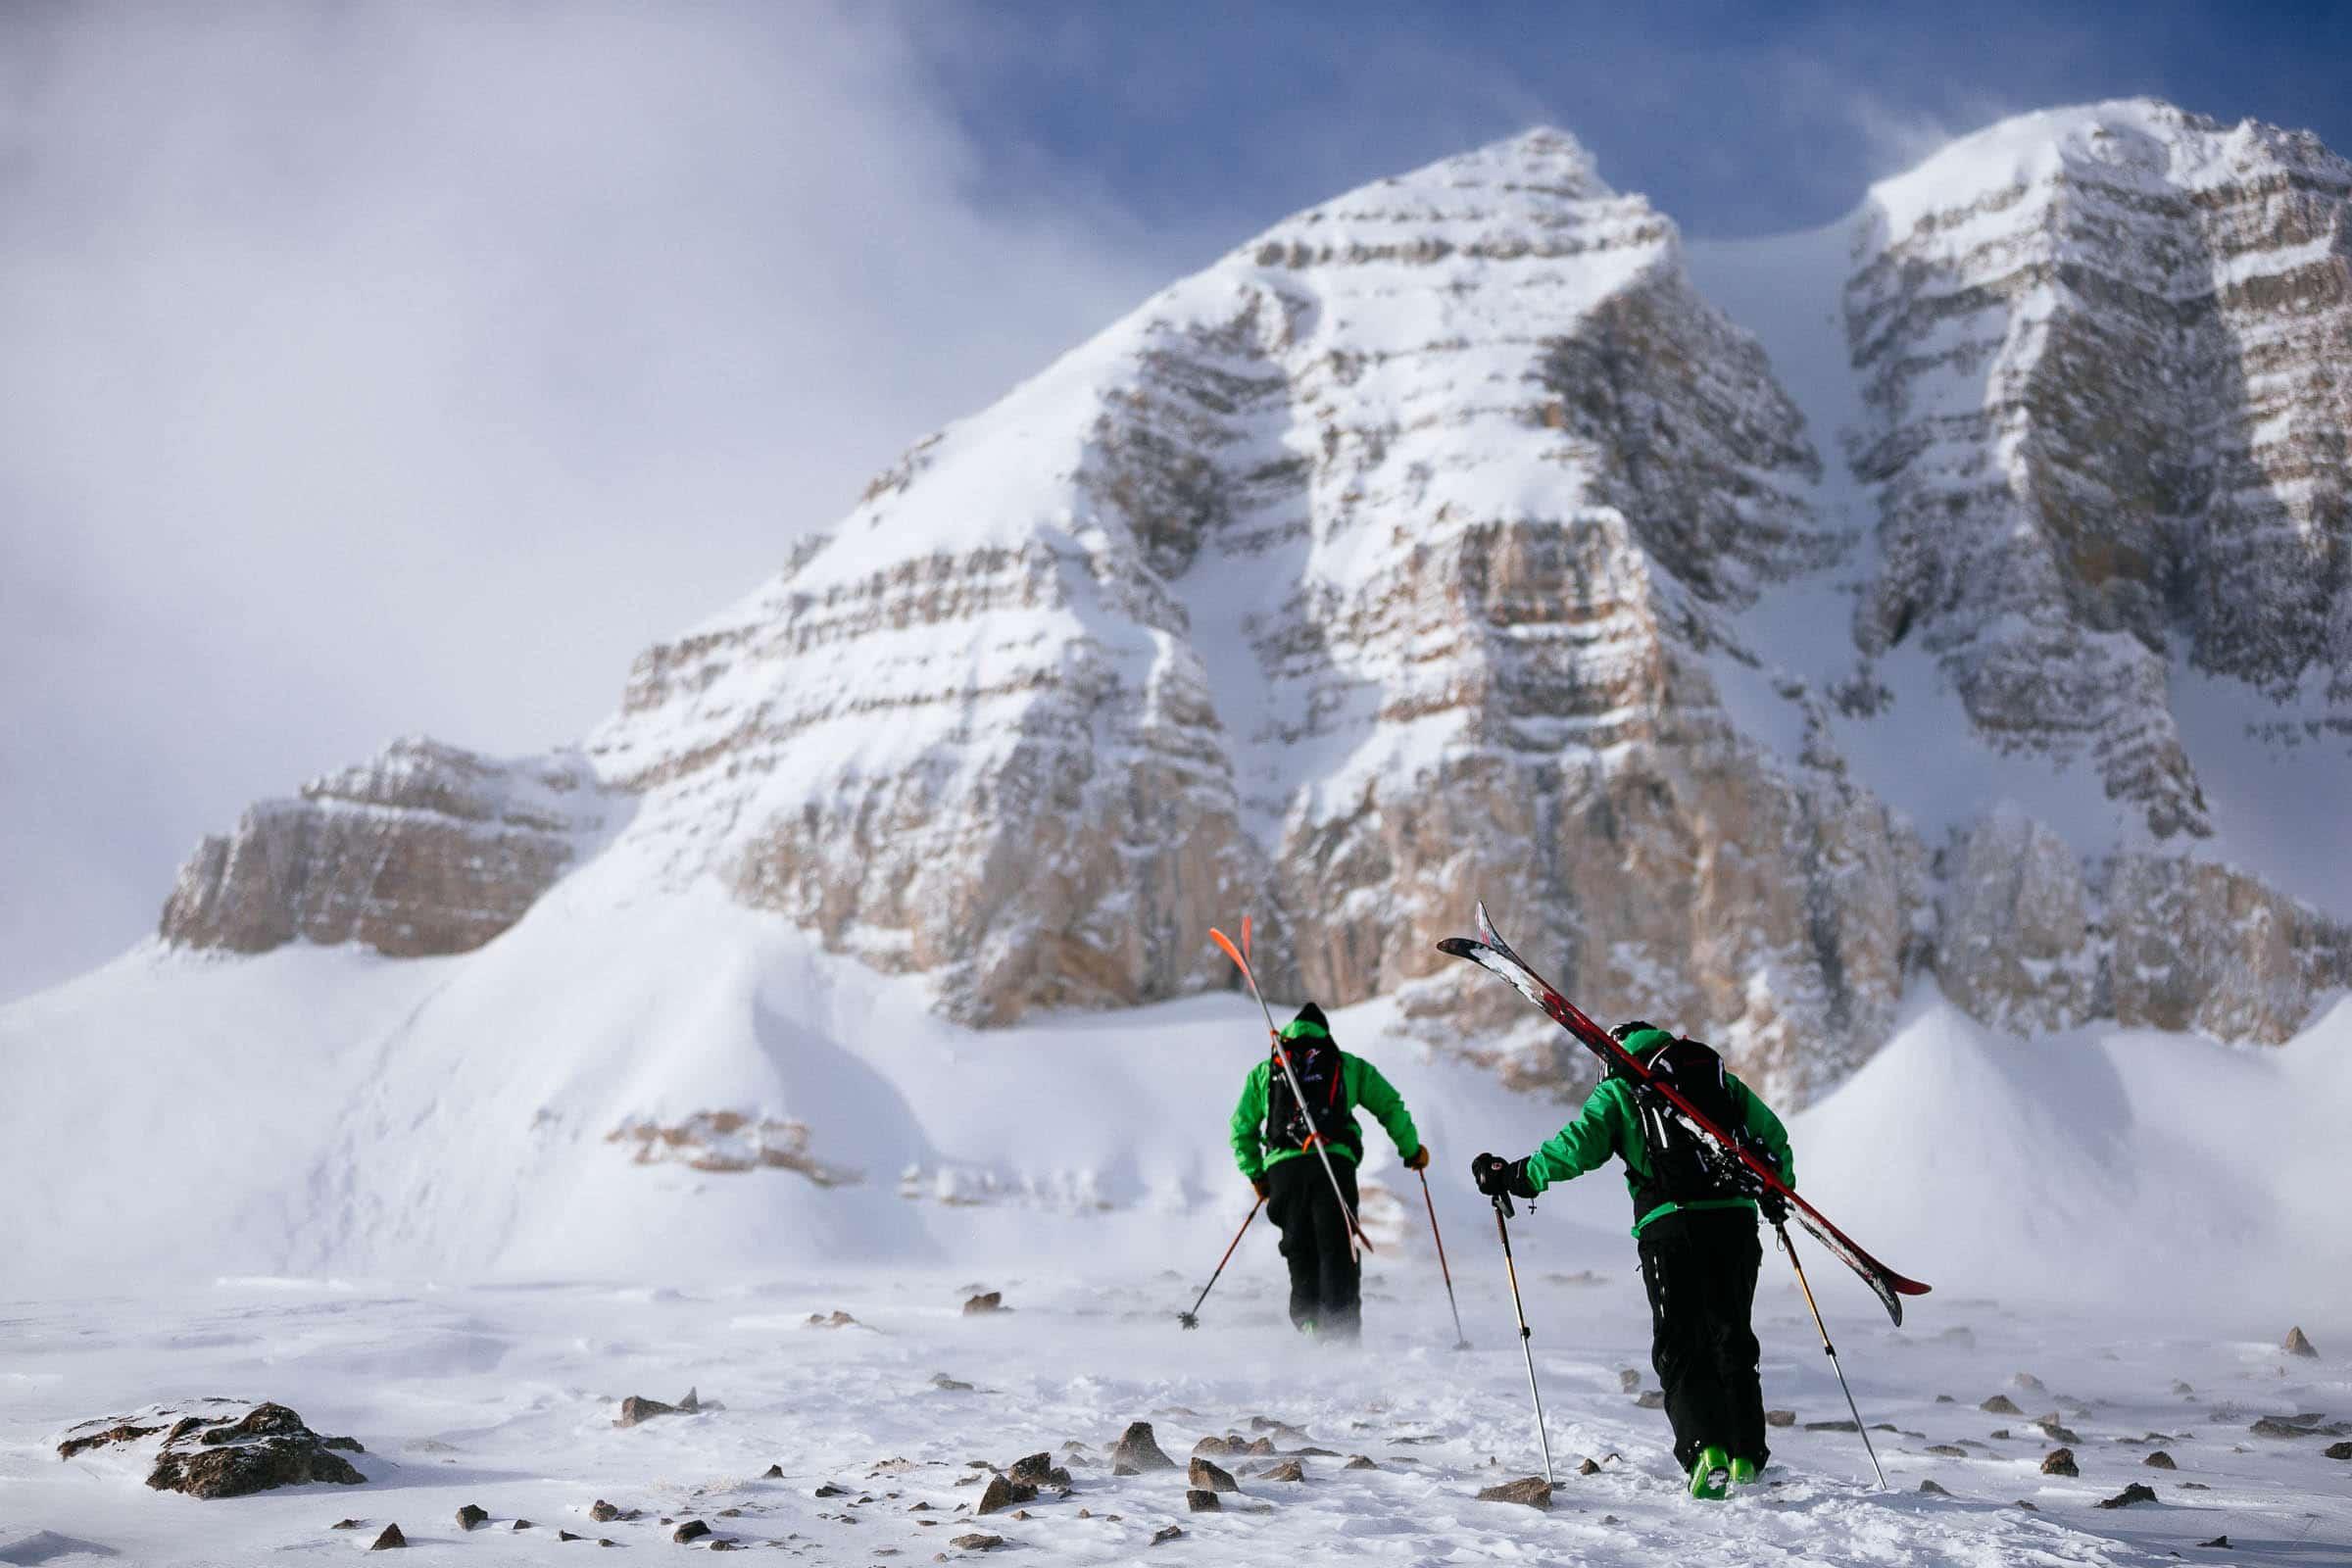 Sam Sehnert and Ethan Valenstein hike towards Powder 8 face off of Cody Peak